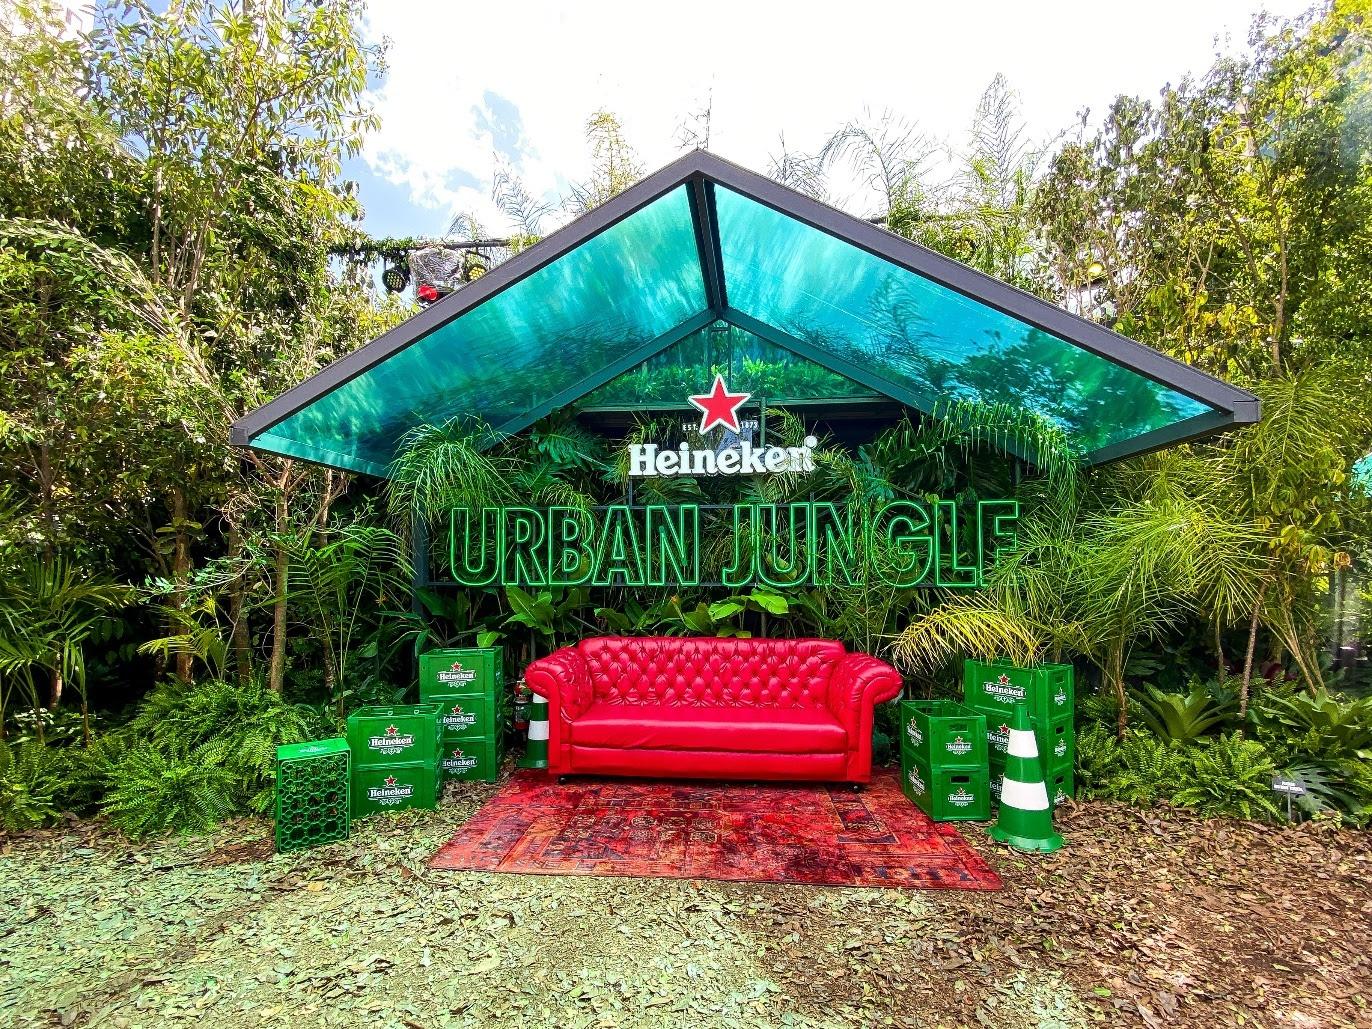 Heineken_Urban_Jungle_sofa_vermelho